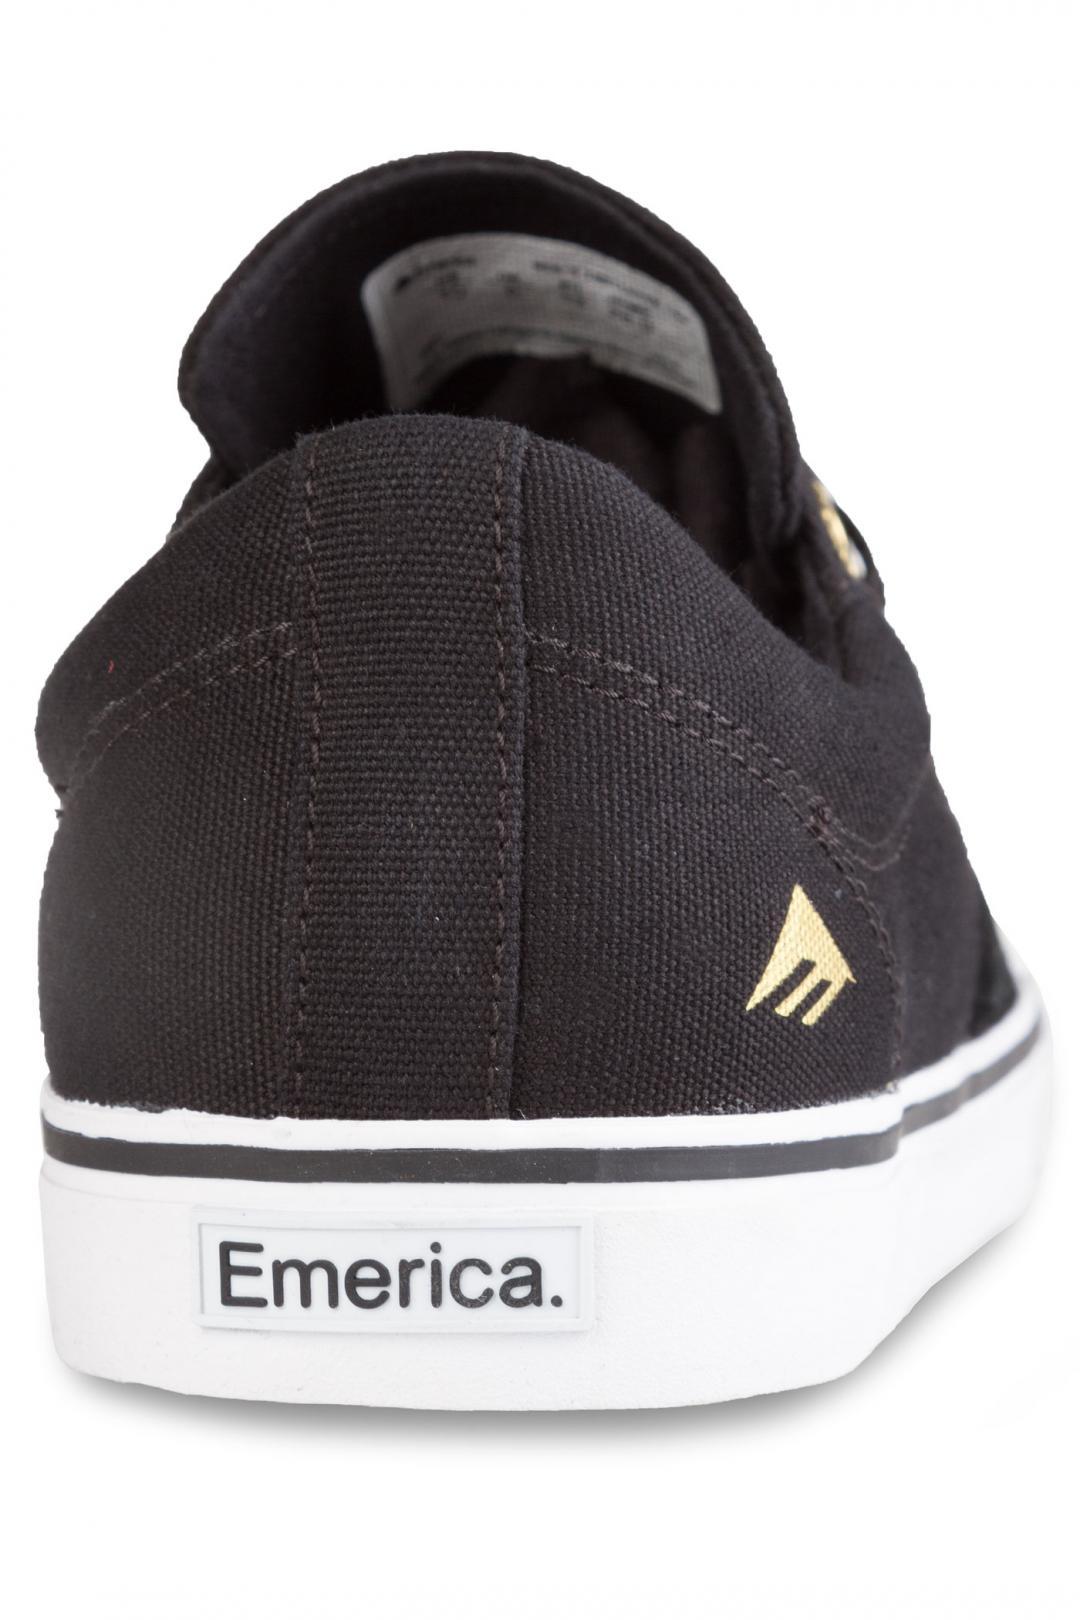 Uomo Emerica Indicator Low black white | Scarpe da skate